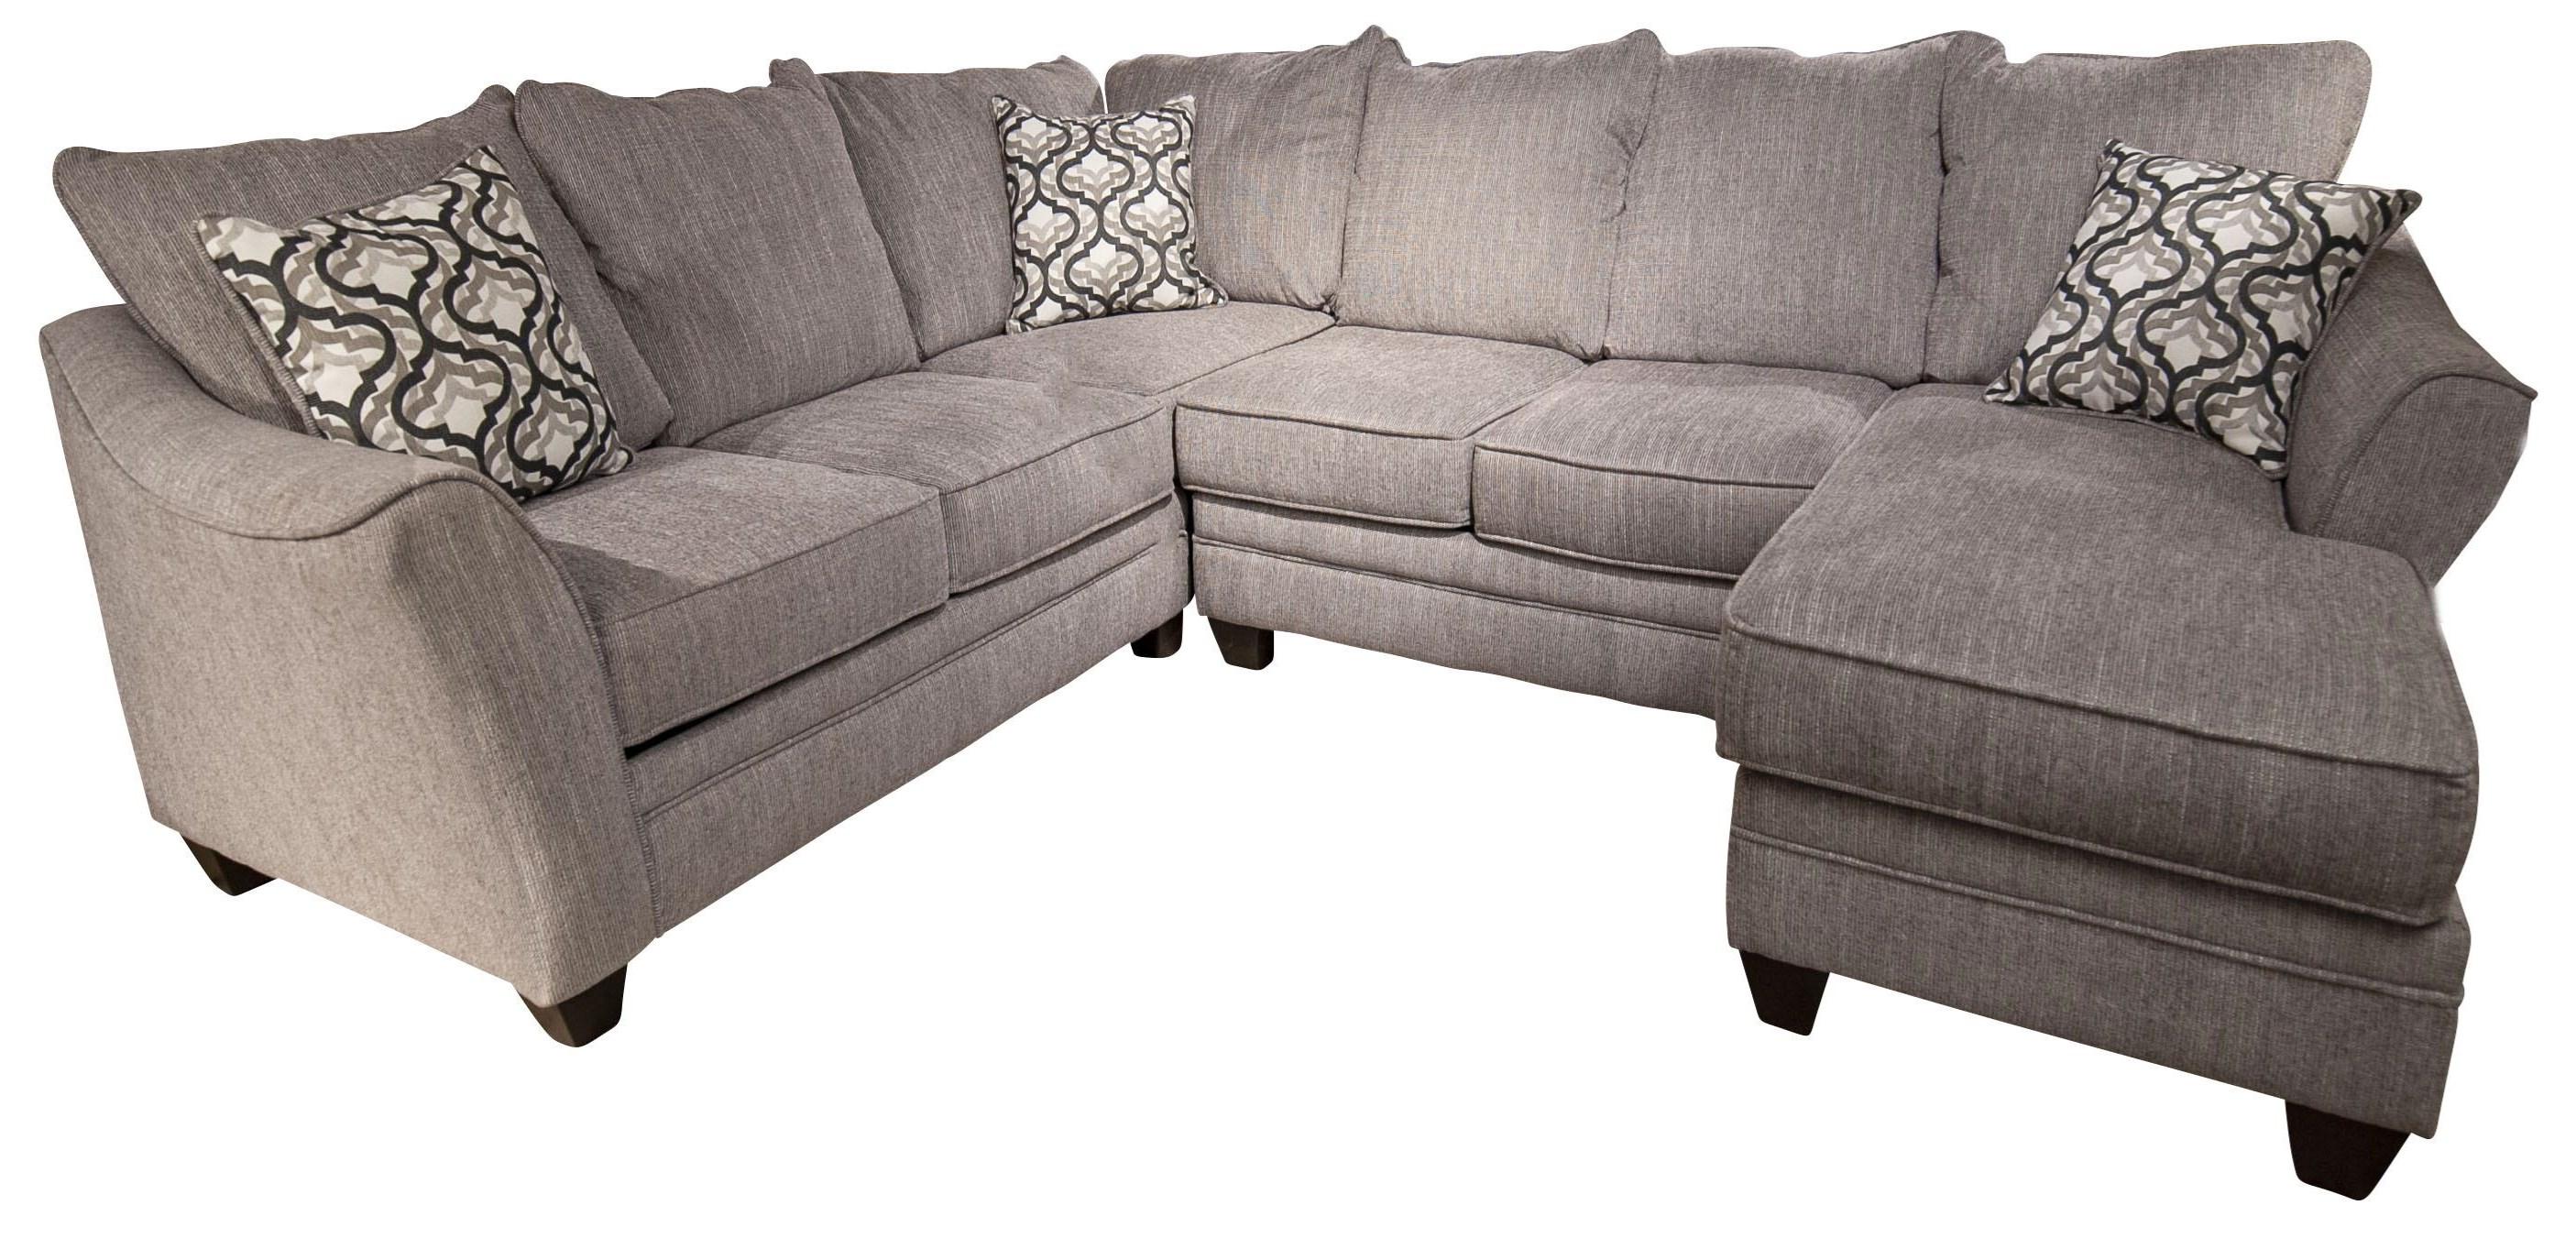 Belford Sectional Sofa